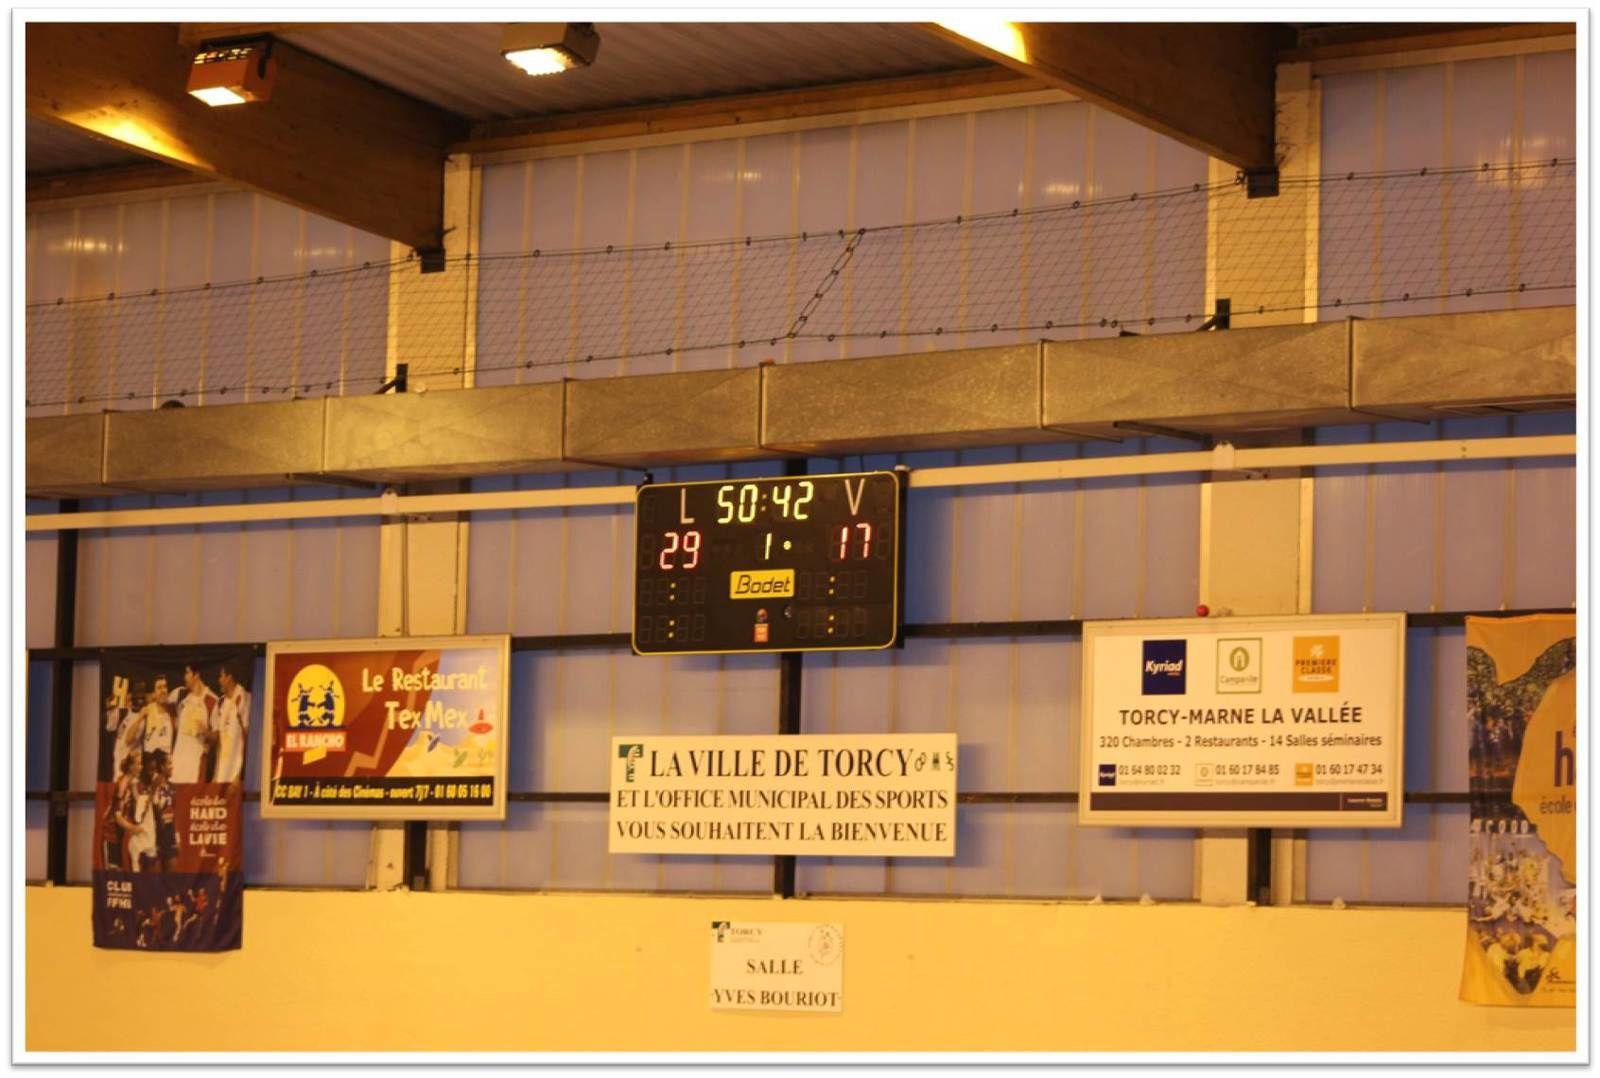 THBMLV 2 vs VILLEPARISIS (Prépa Séniors - 10.09.2015)